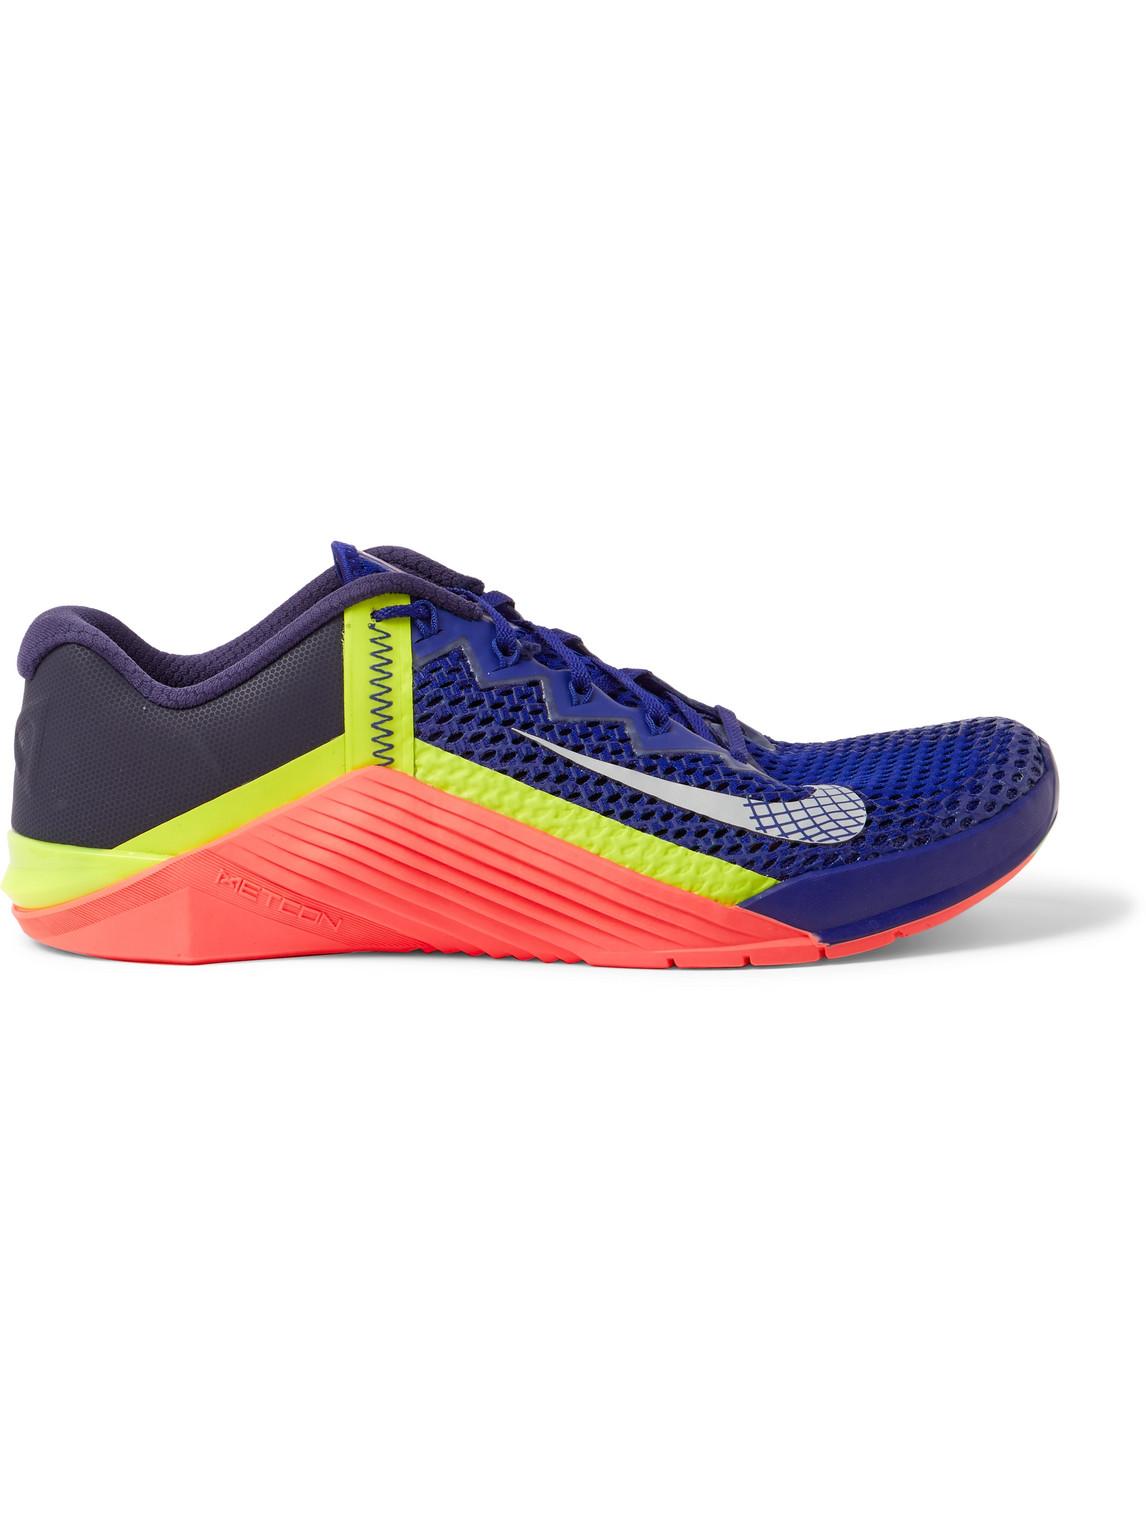 Nike Metcon 6 Men's Training Shoe (deep Royal Blue)